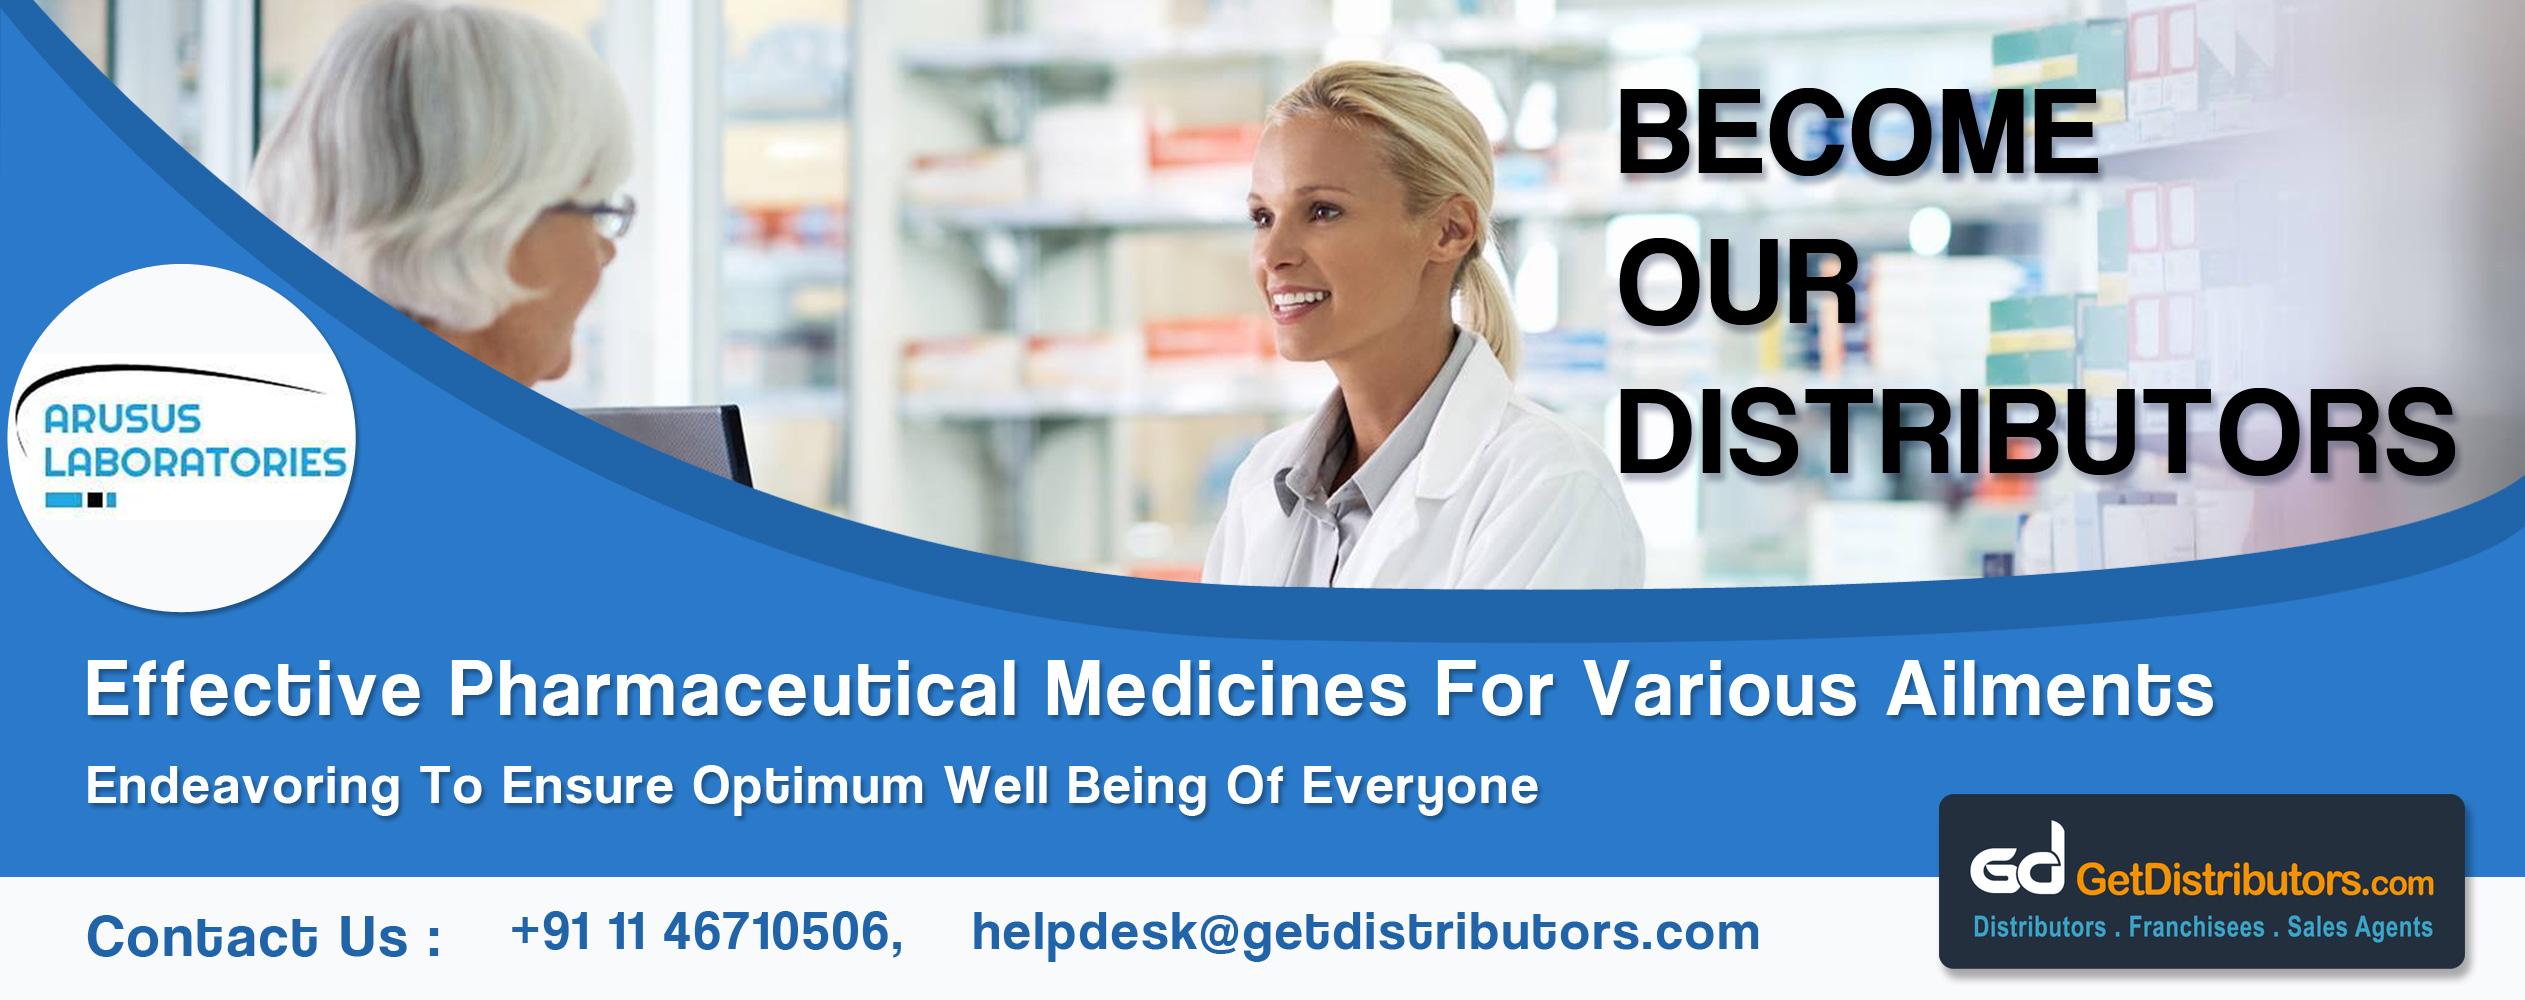 Arusus Laboratories requires distributors for pharmaceutical medicines